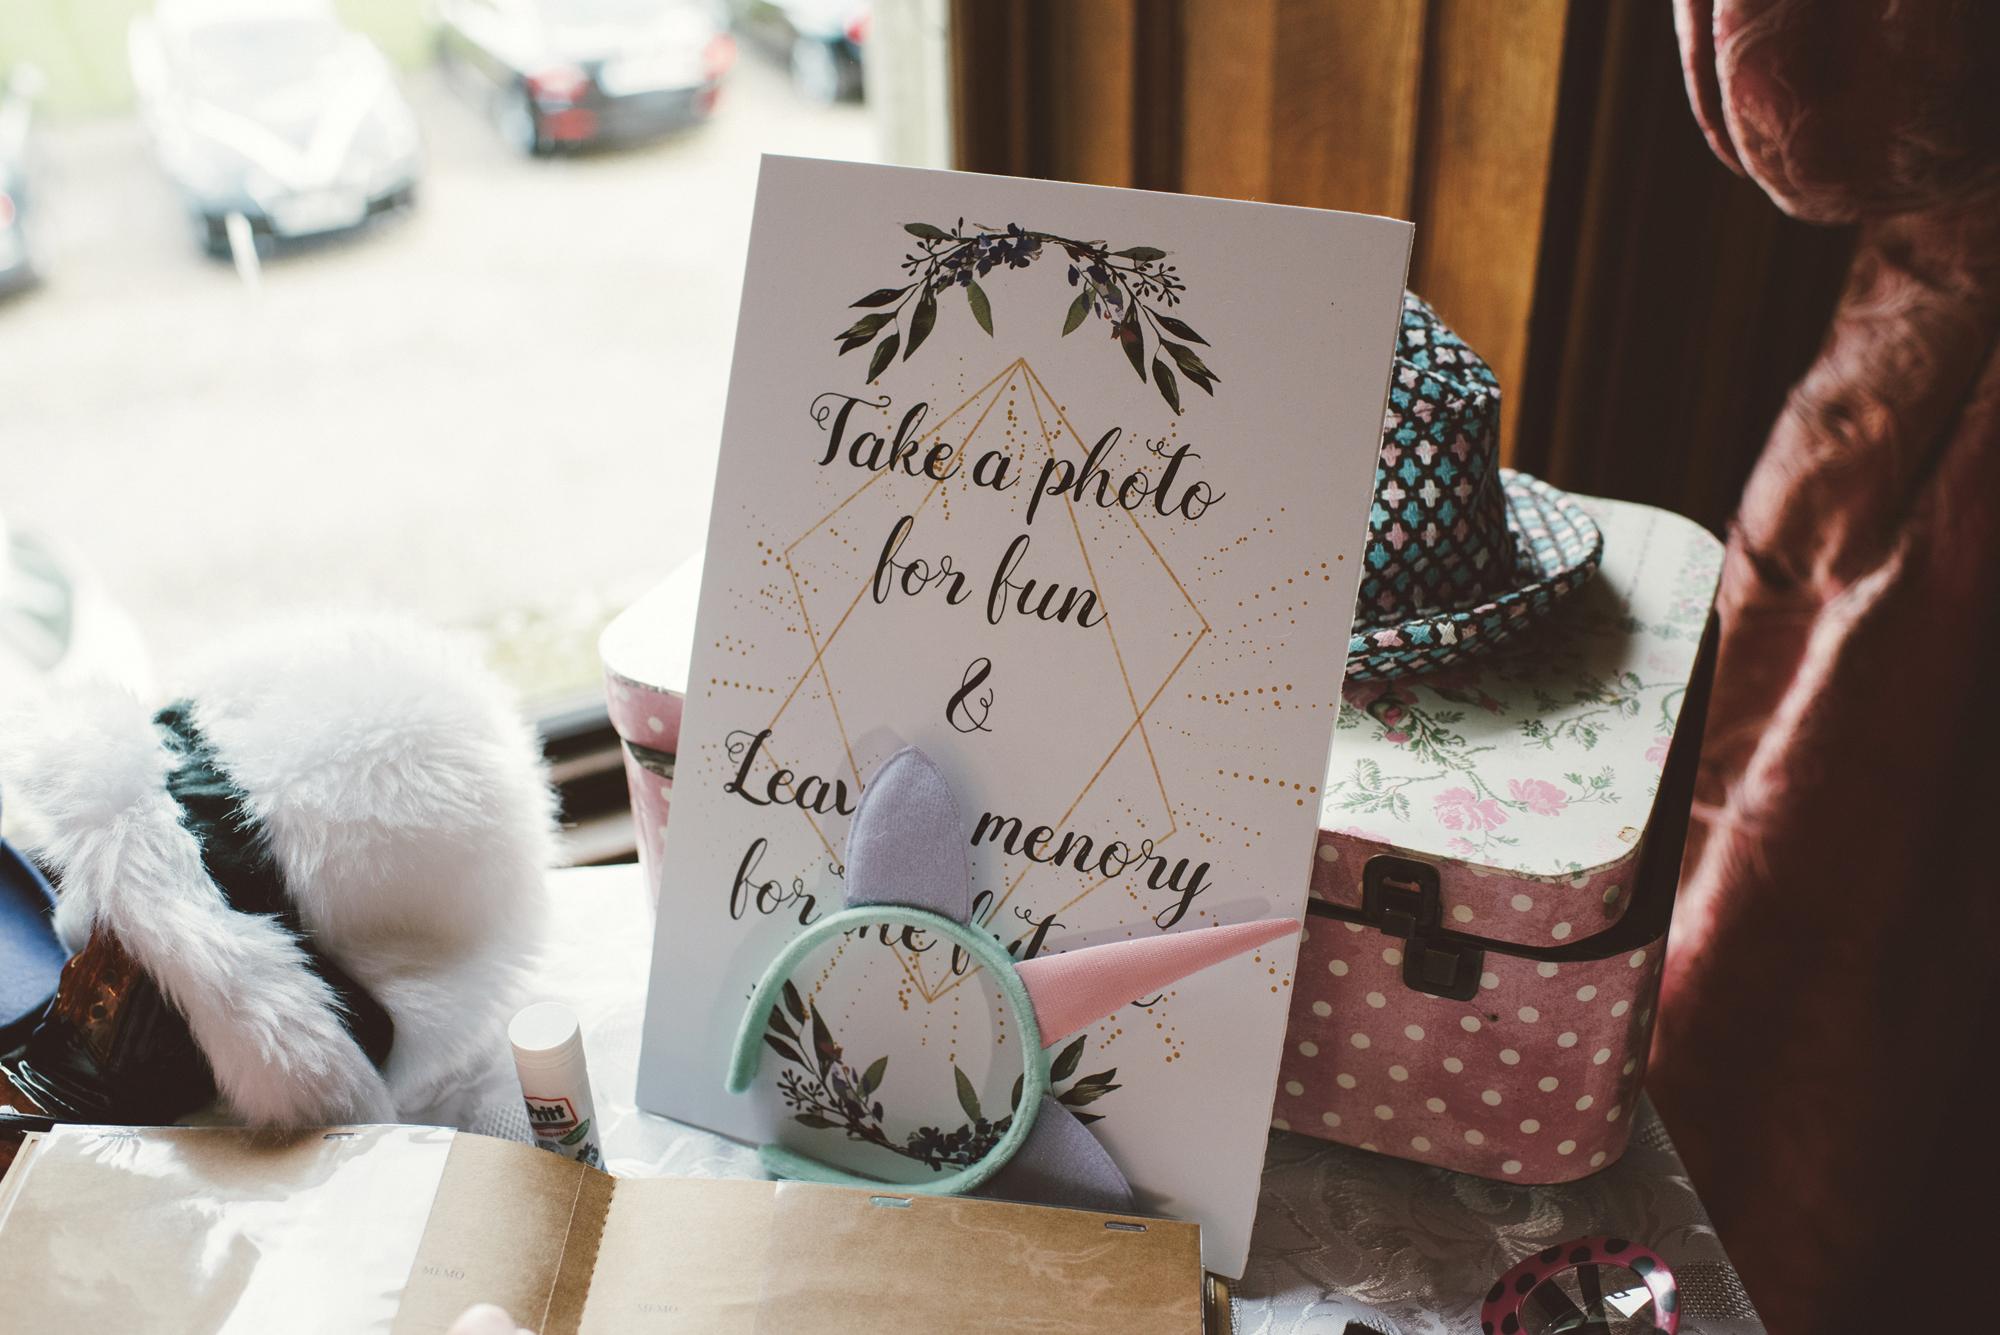 wedding-photo-booth-ideas-northern-ireland-inspire-weddings.jpg